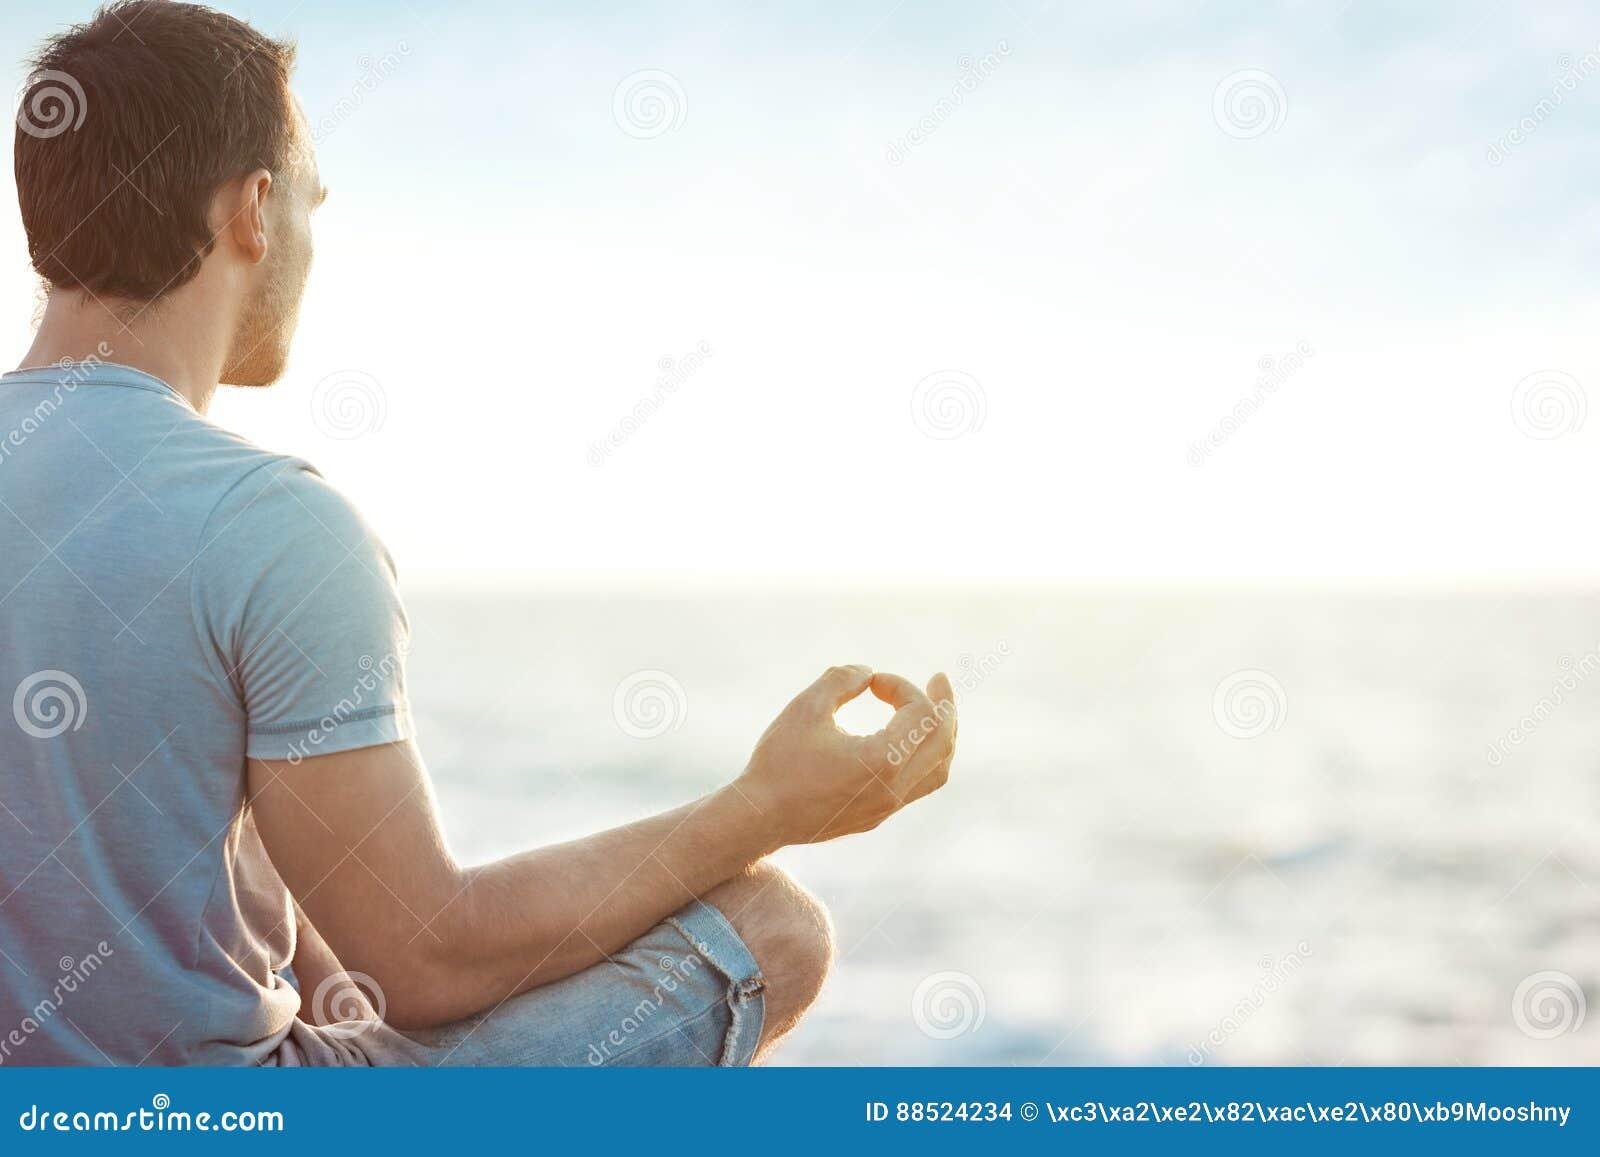 Man in meditation near the sea